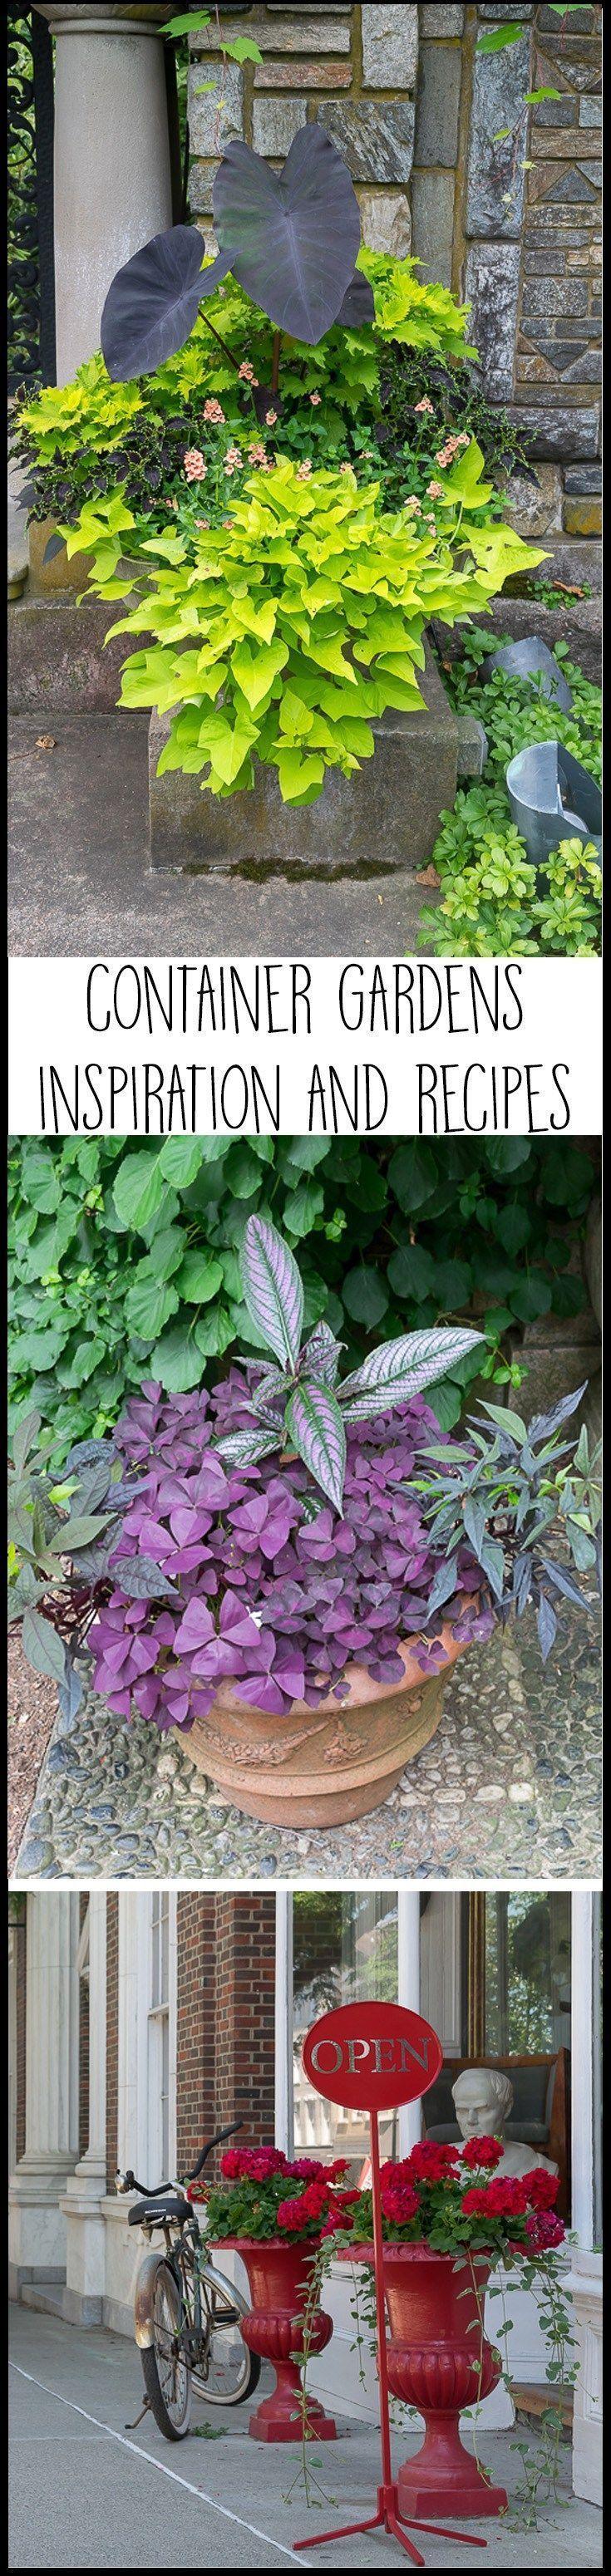 Container Garden Ideas: Inspiration and Recipes #2 #shadecontainergardenideas